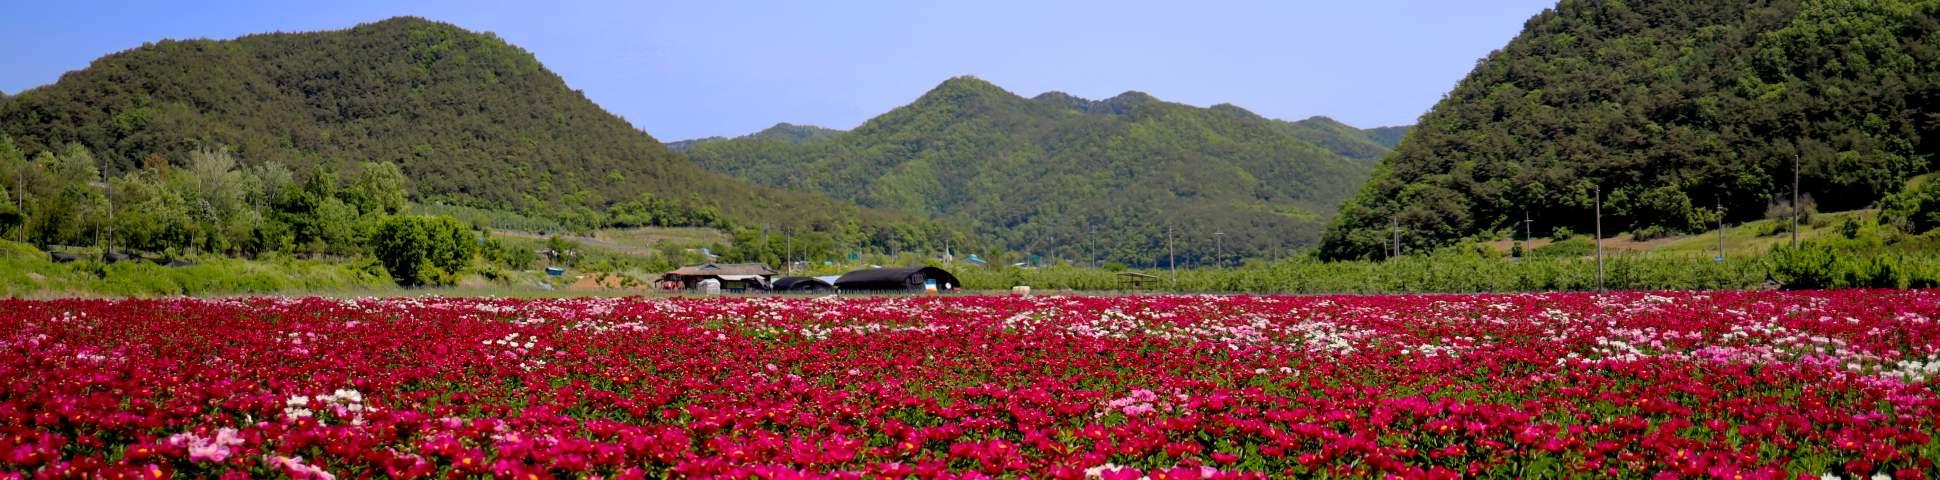 Flowers in Gyeongsangbuk-do (South Korea)